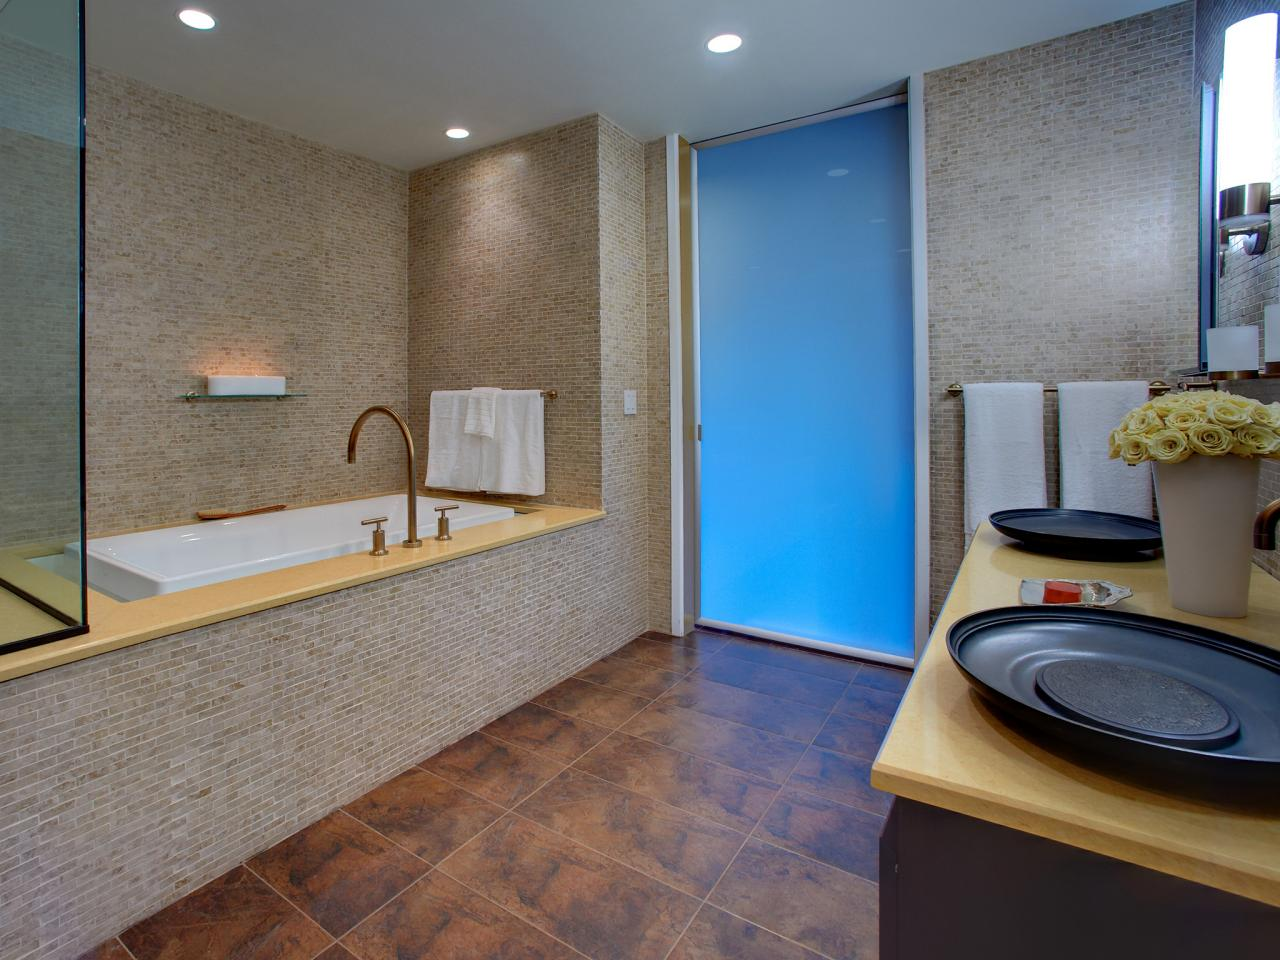 20 Bathroom Designs with Infinity Bathtubs